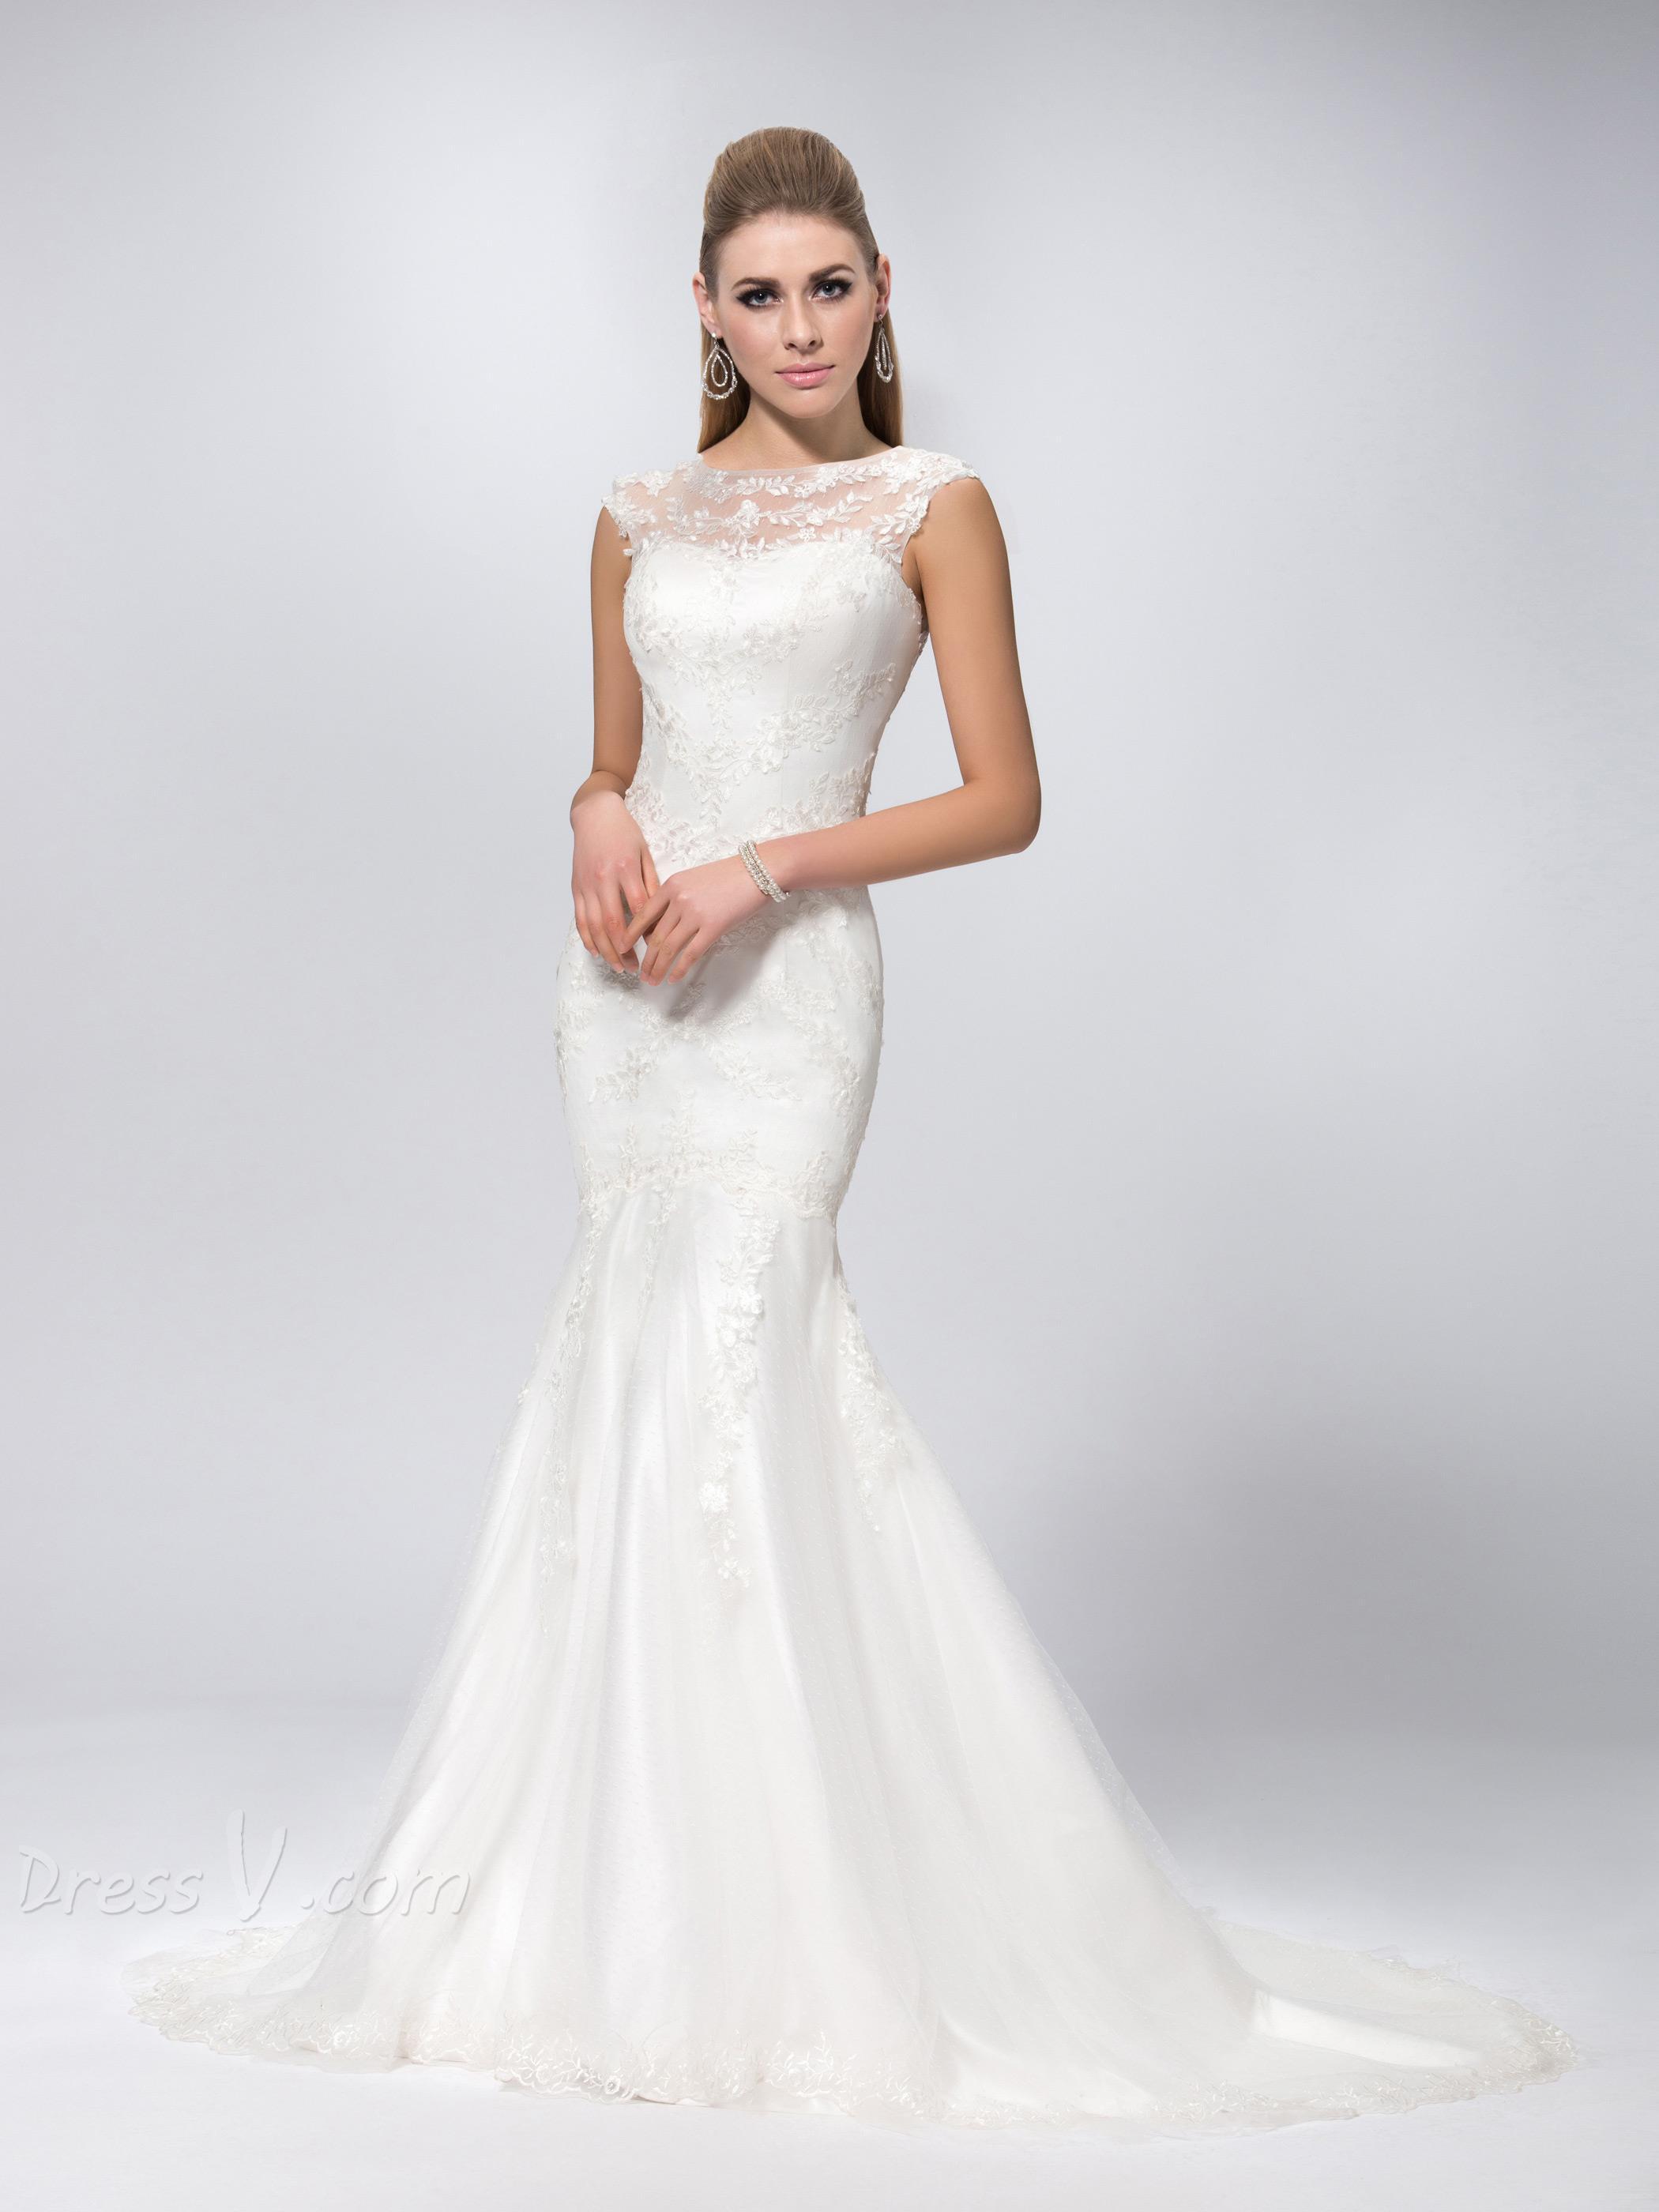 today show wedding dresses photo - 1